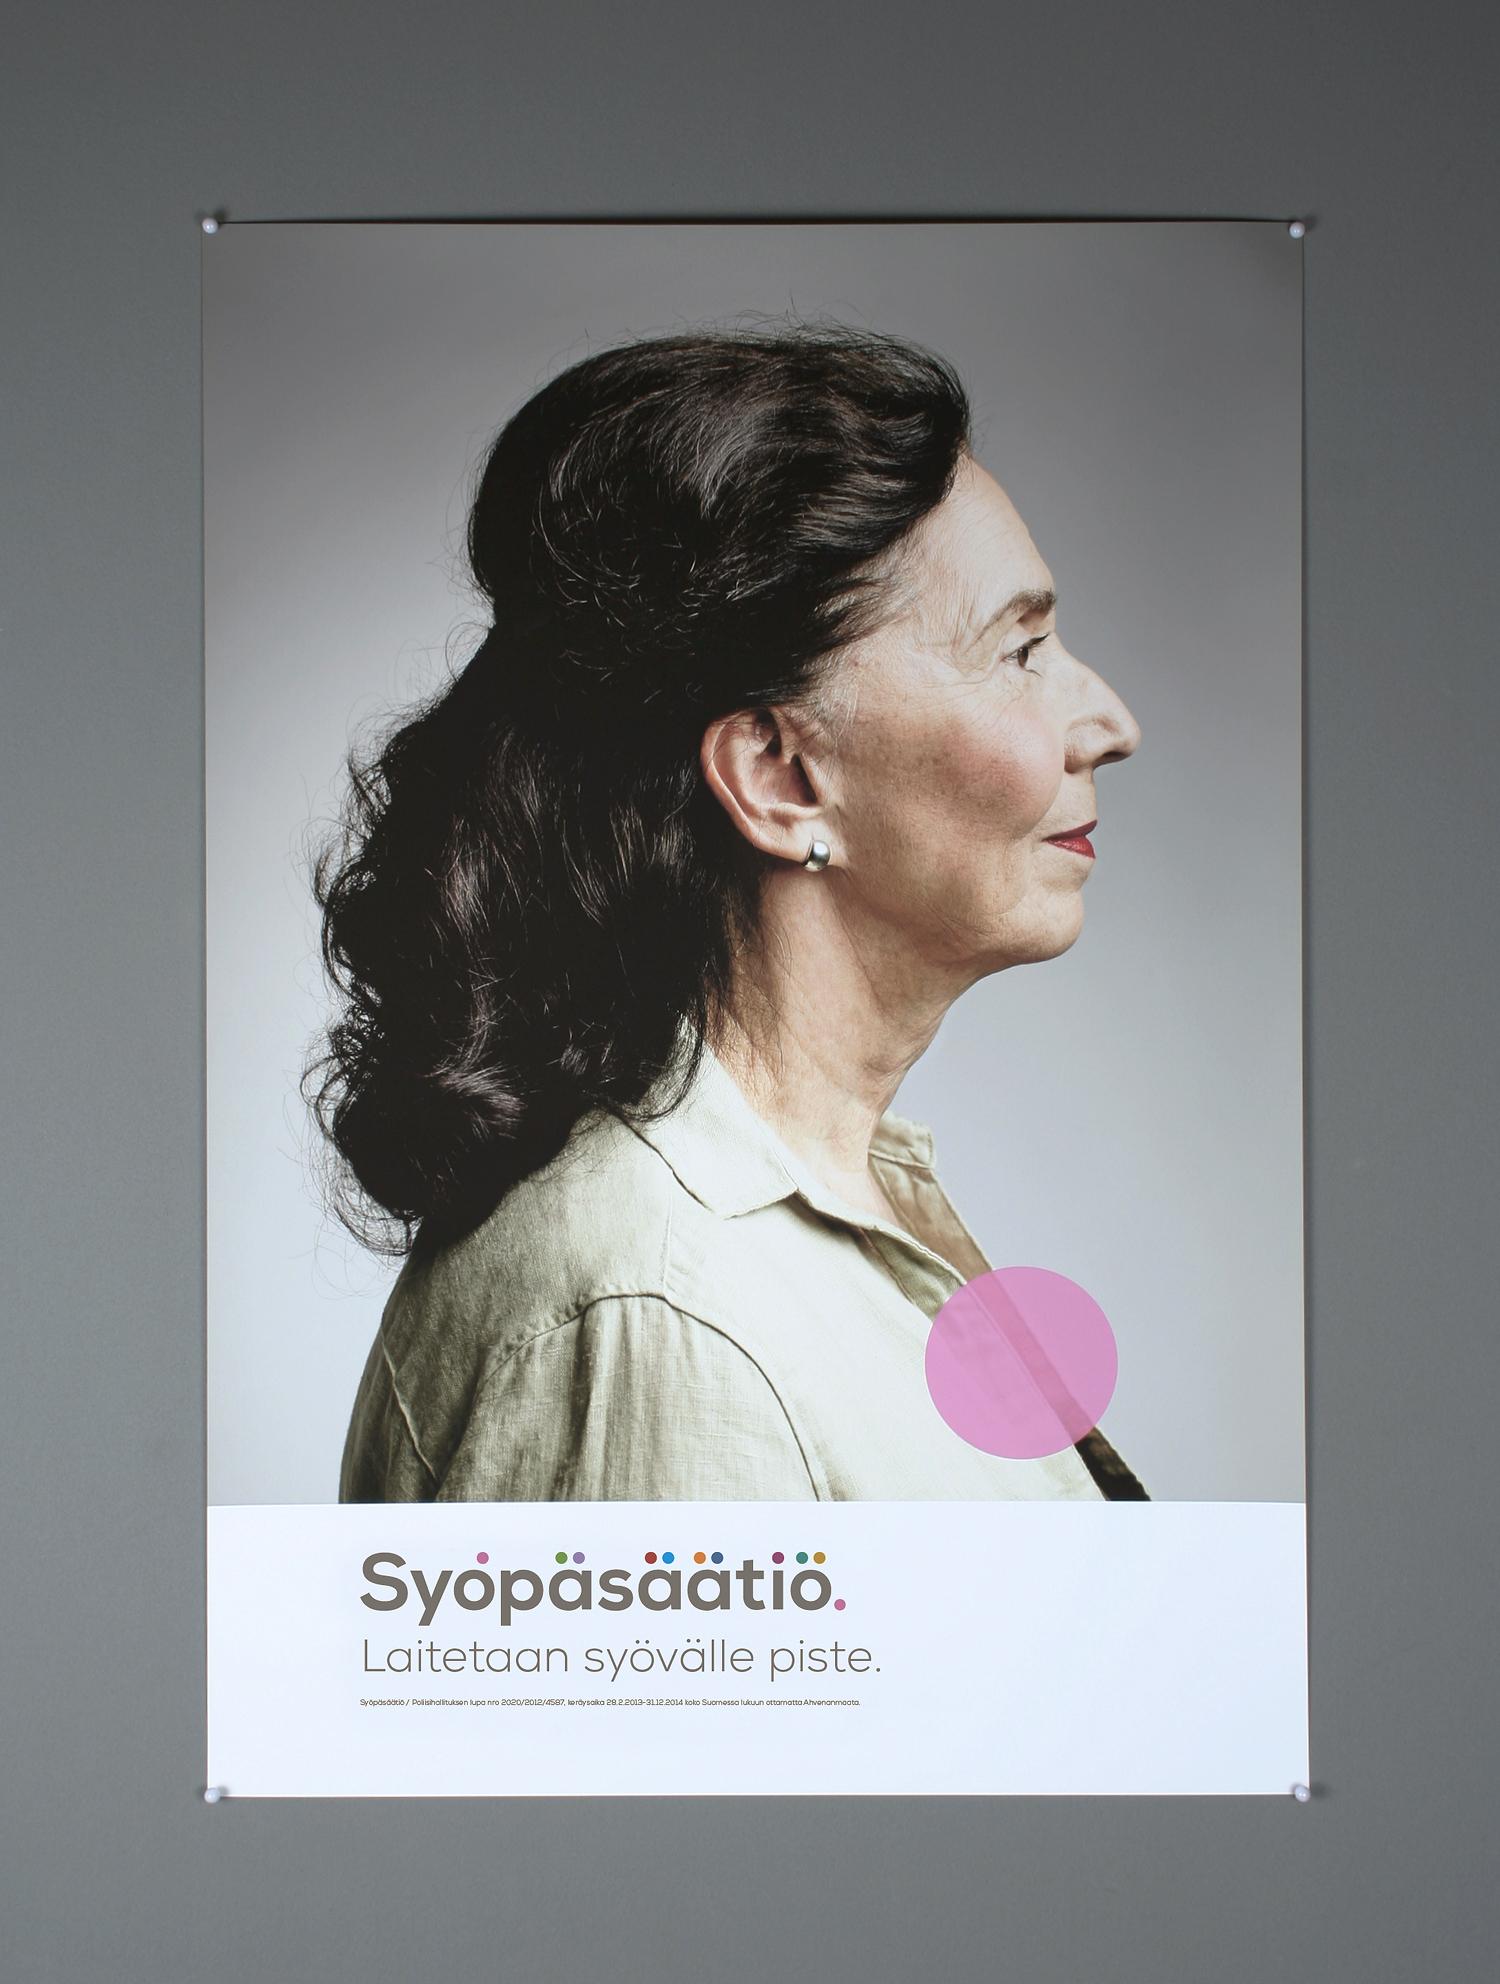 syopasaatio_stationlight2_551x808px